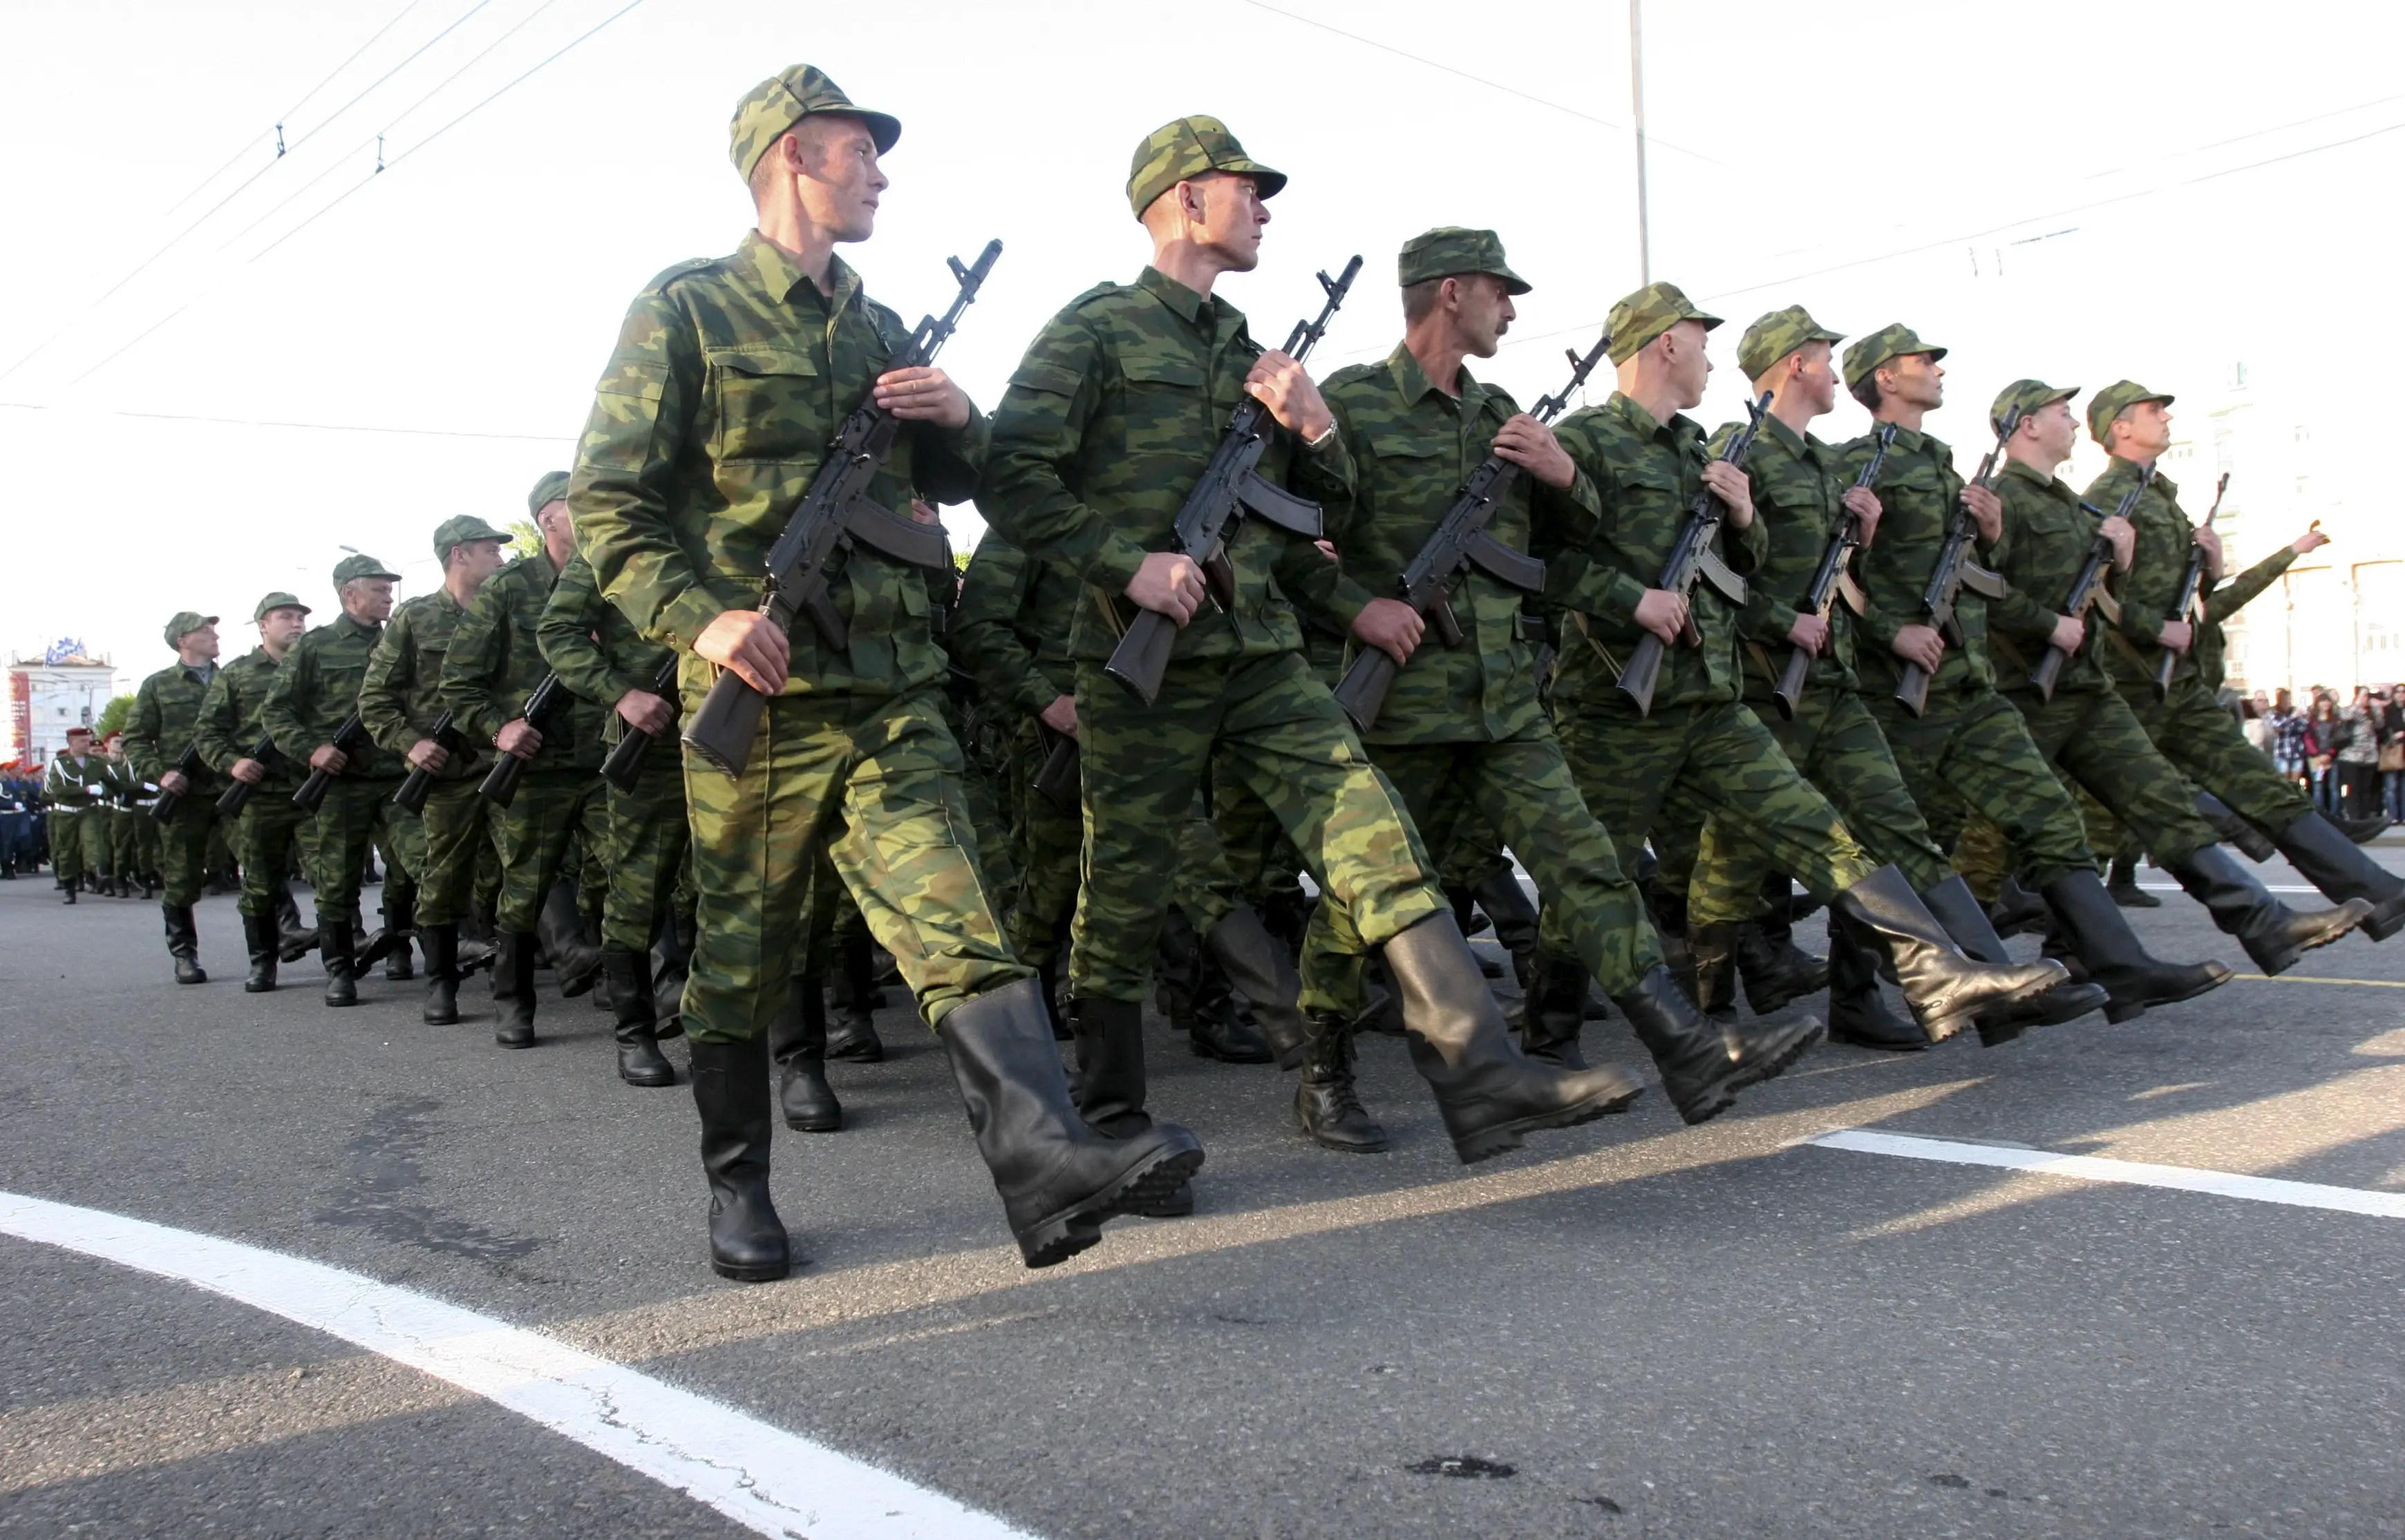 Ukraine rebels military parade